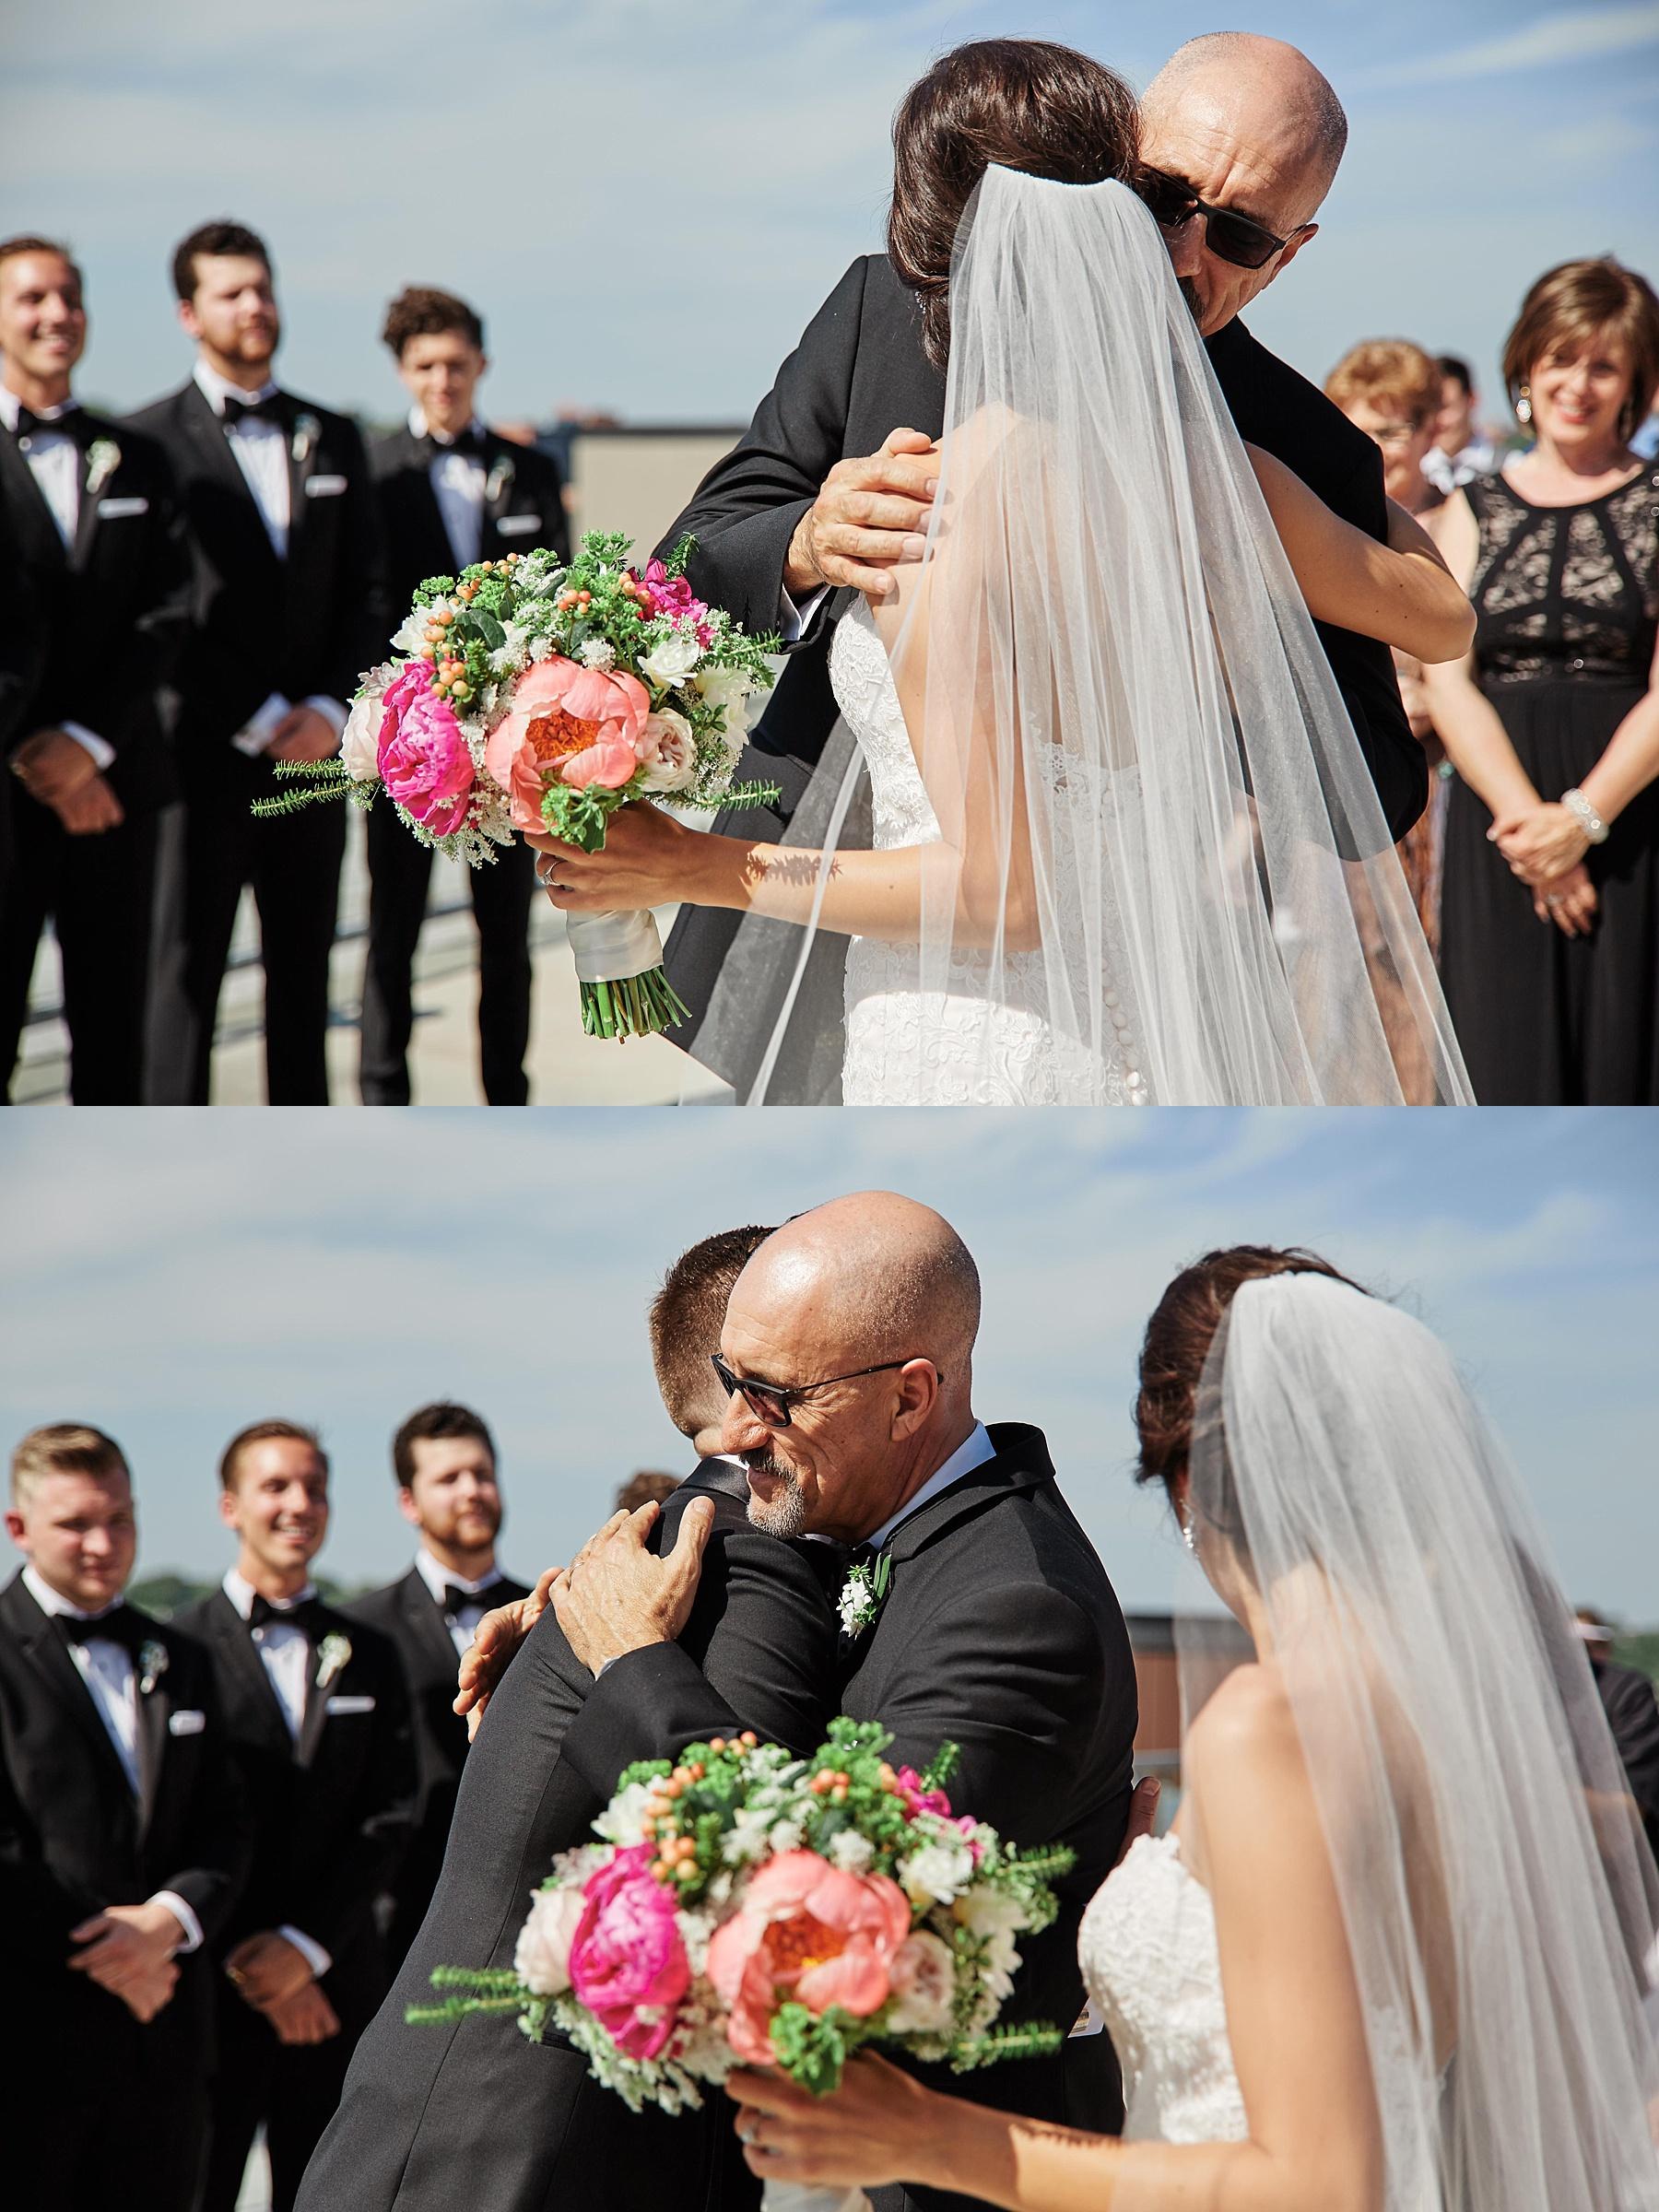 ABULAE-Wedding-Saint-paul-MN-Josh-Sofia-Wedding-Mears-Park_0758.jpg